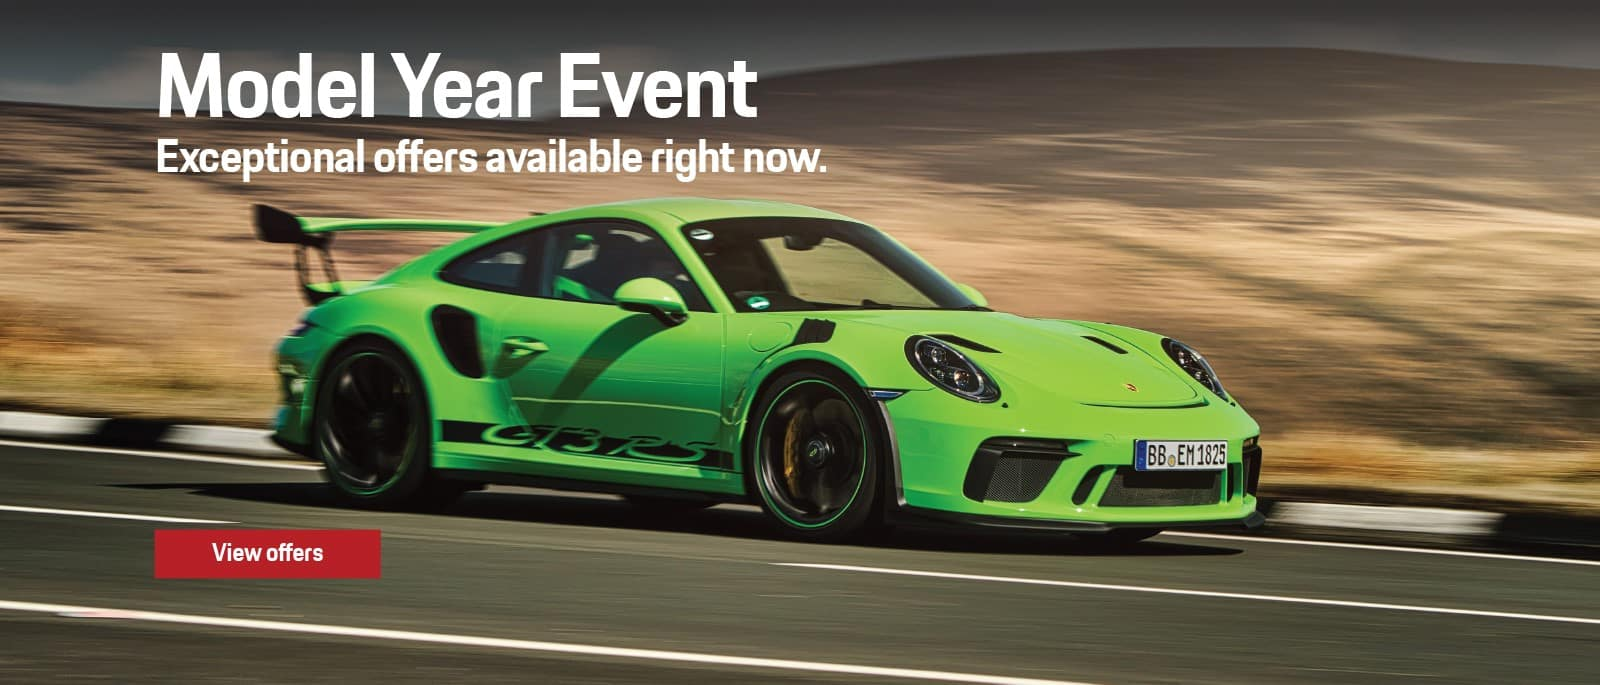 2019 Porsche Model Year End Sale